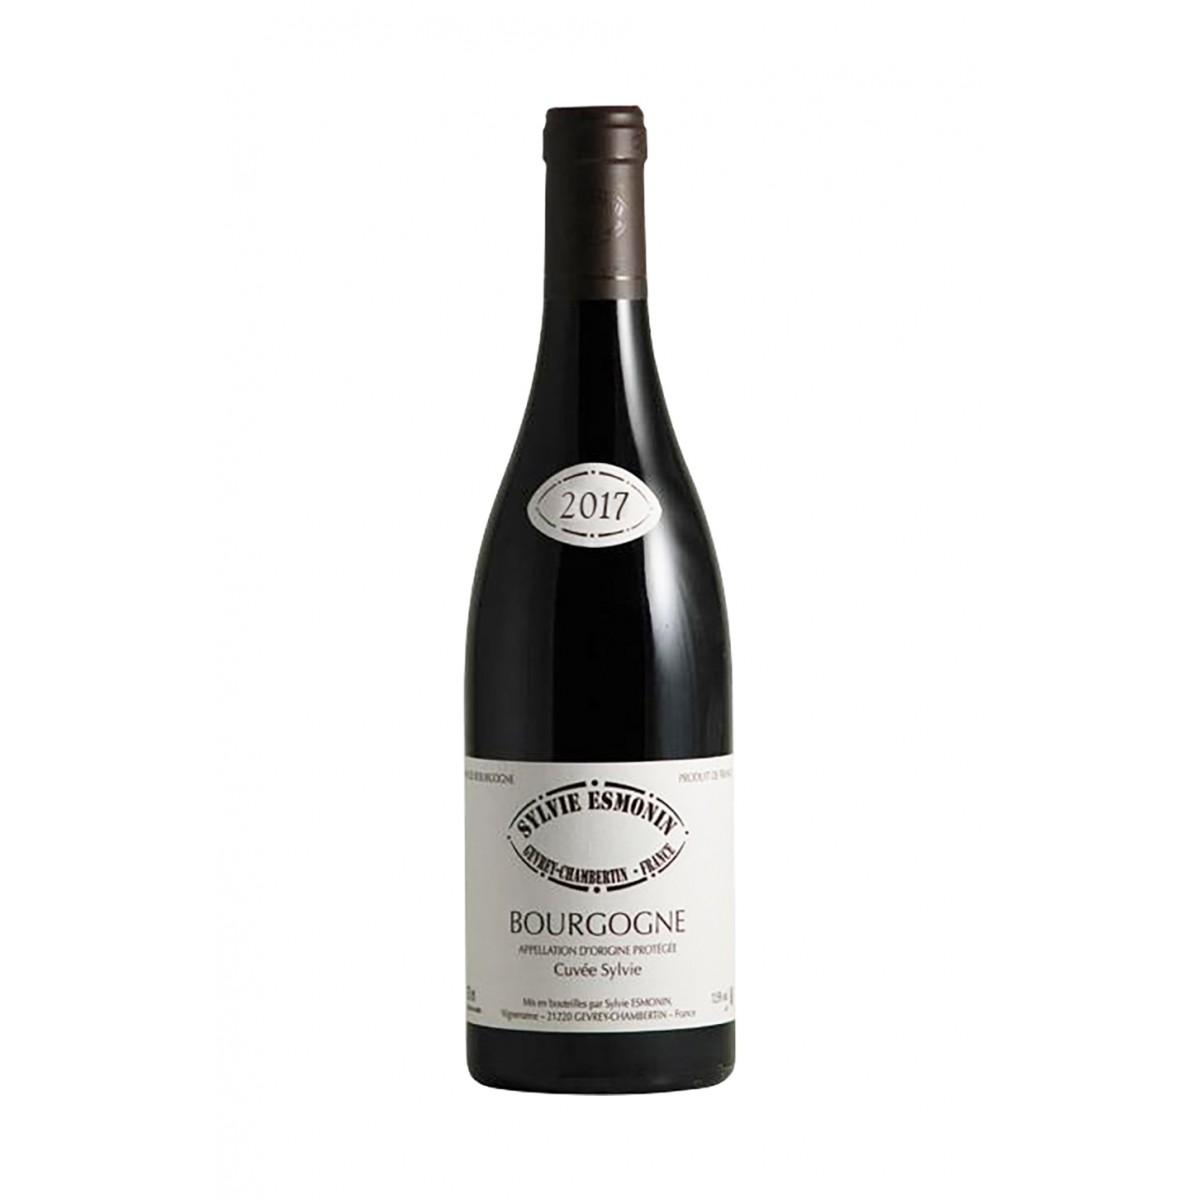 Bourgogne Rouge 2017 - Domaine Sylvie Esmonin